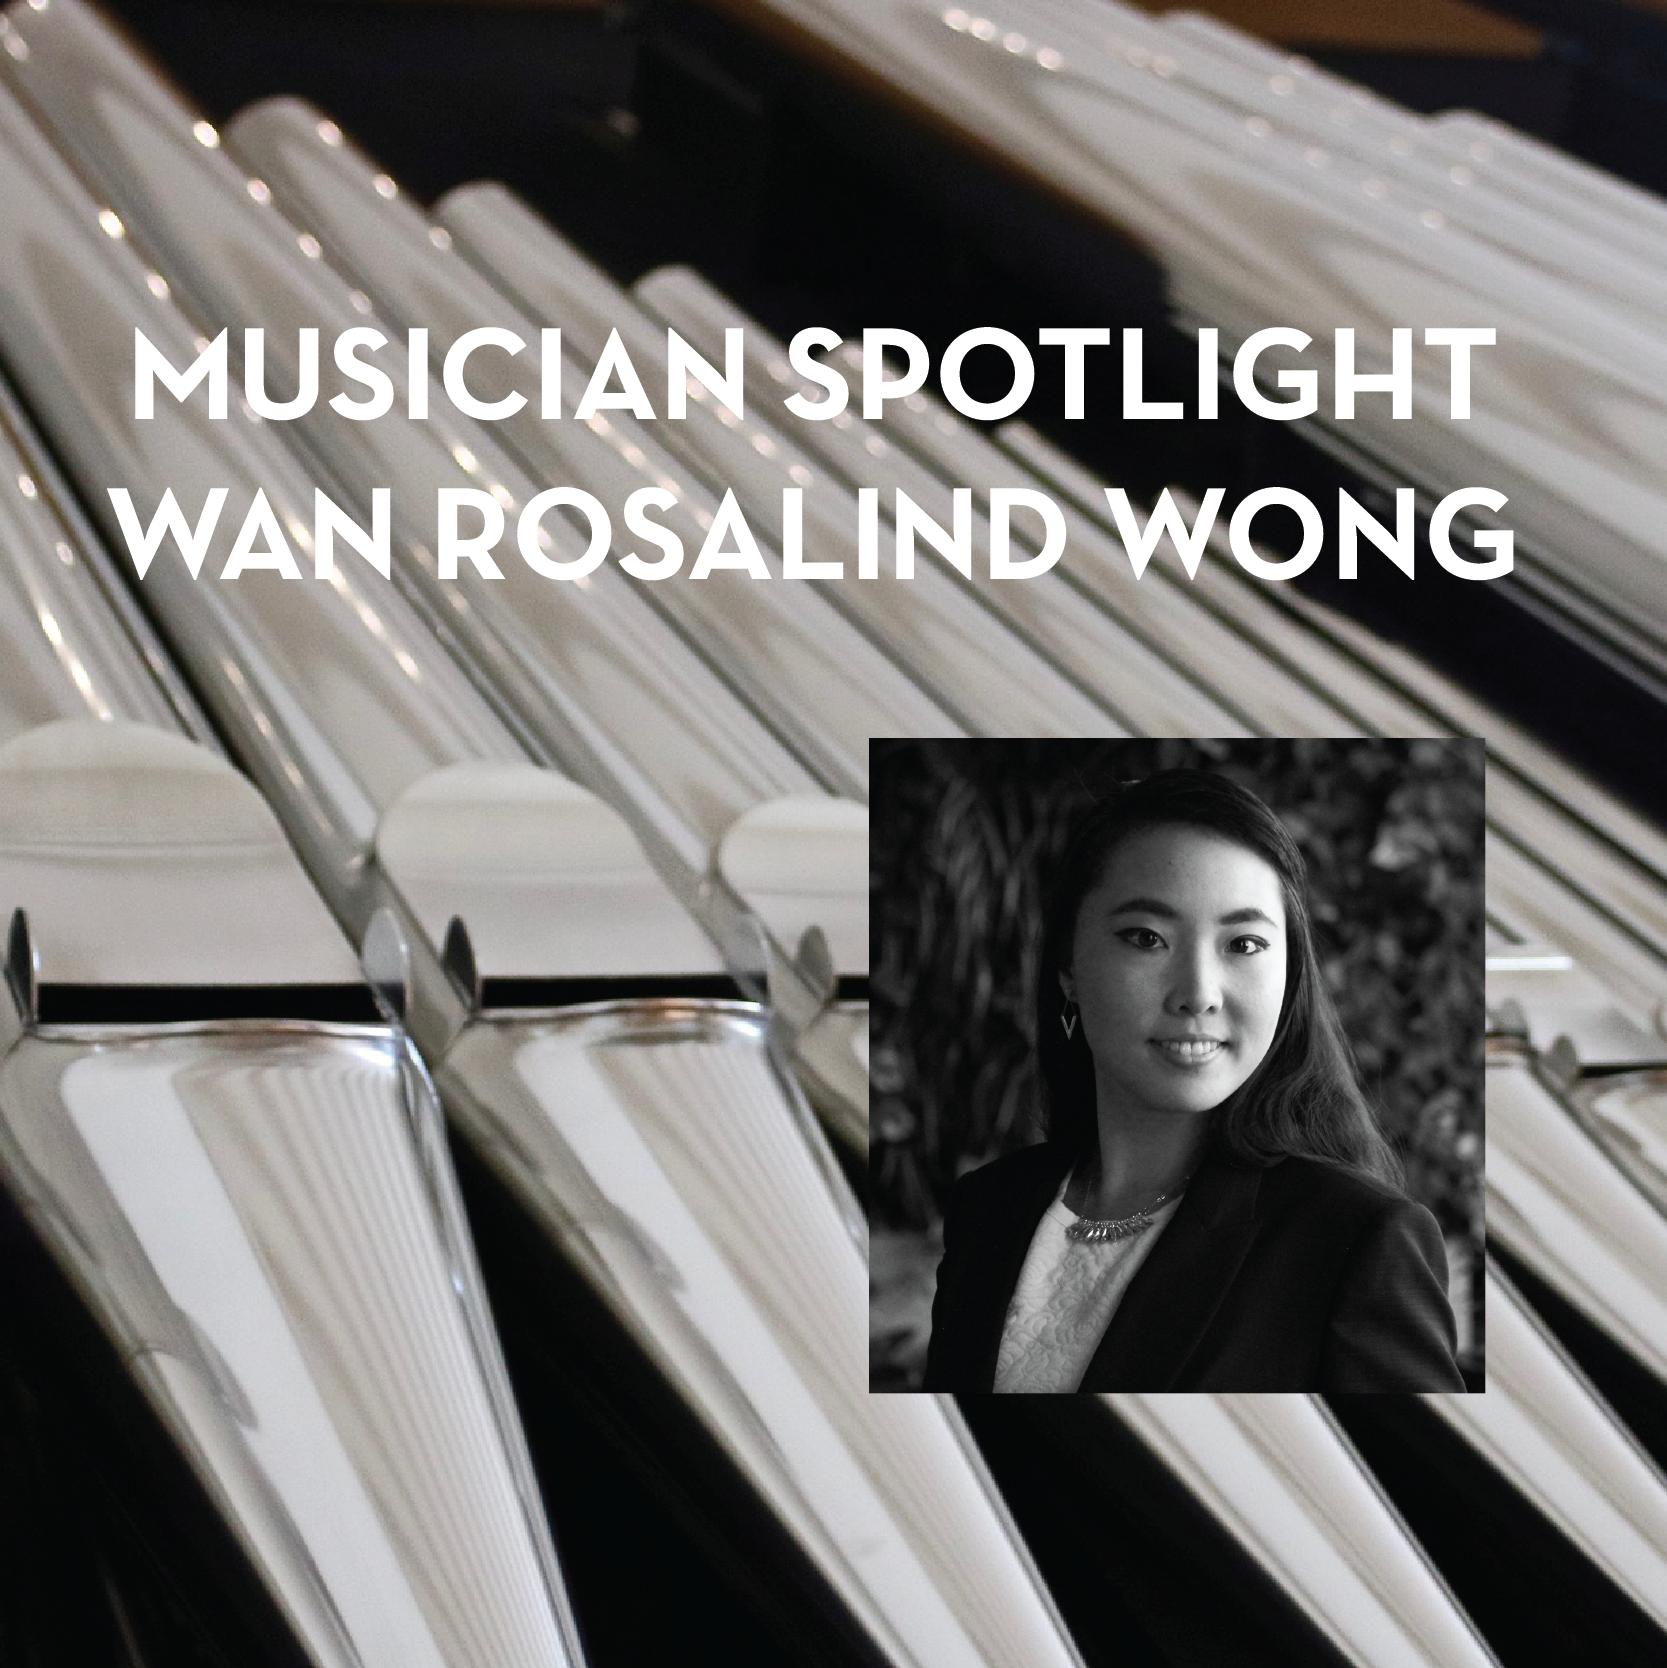 Musician Spotlight: Wan Rosalind Wong, Piano